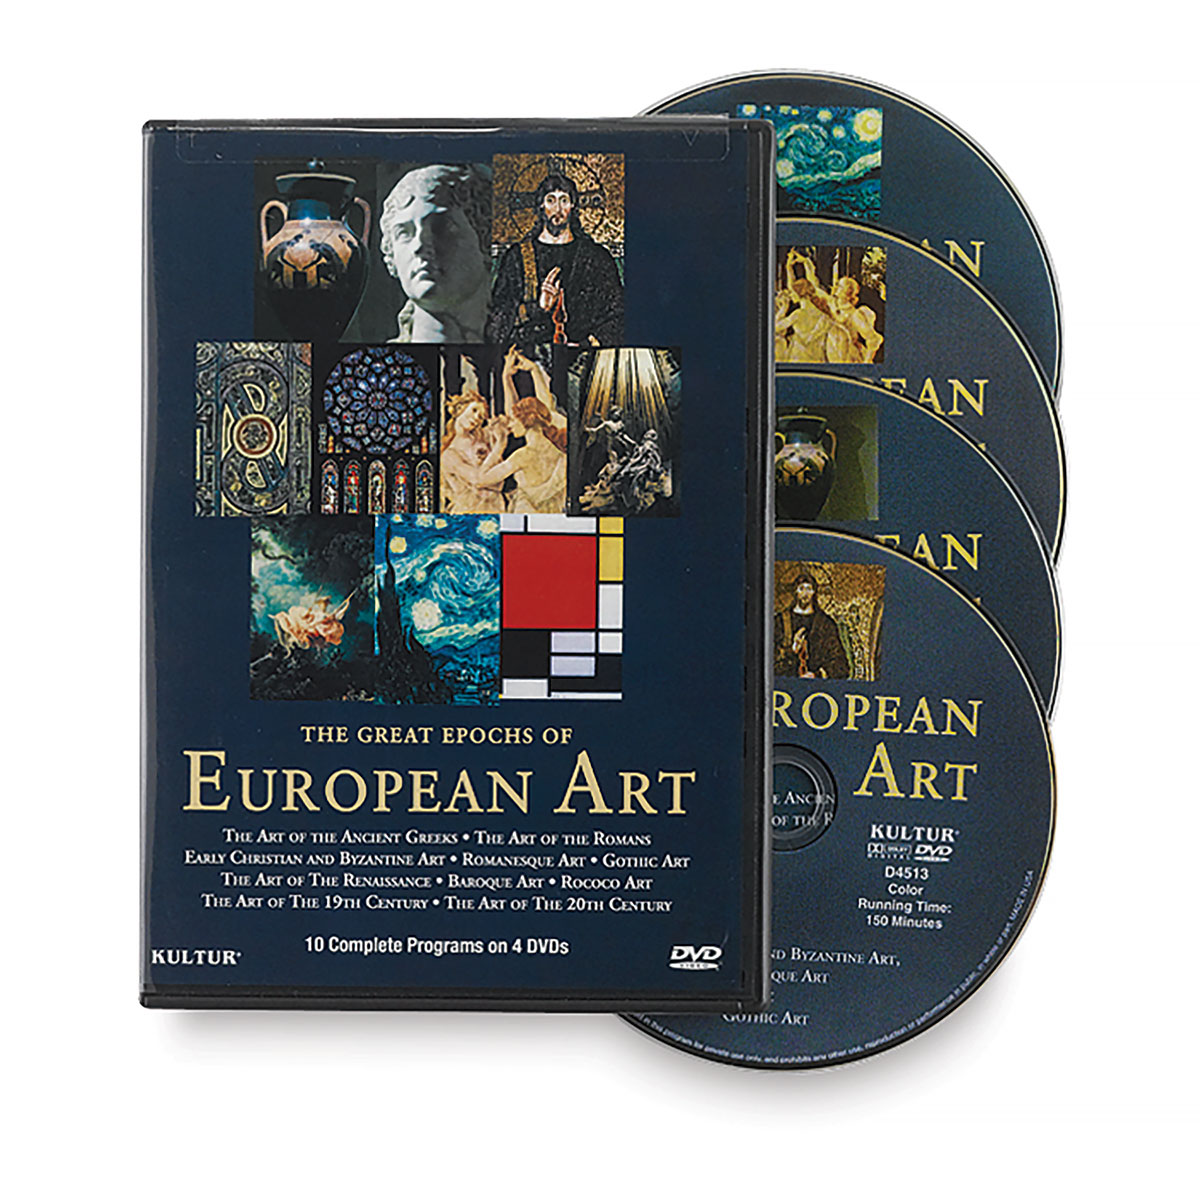 The Great Epochs of European Art DVD Set